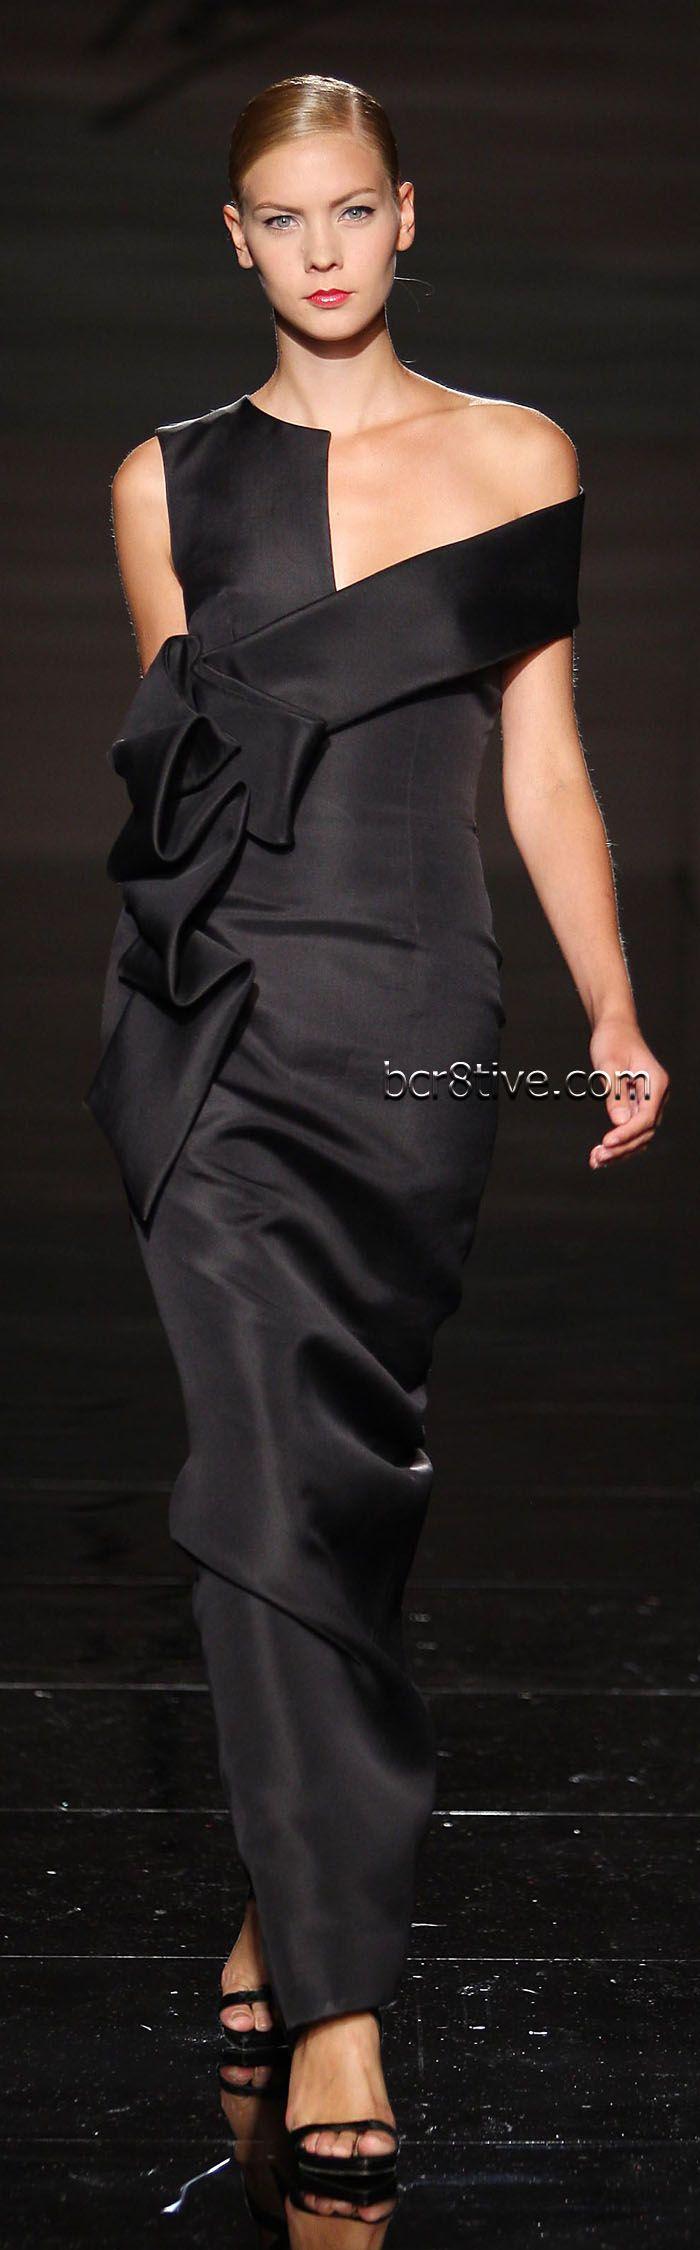 Fausto Sarli Couture - Fall Winter 2009